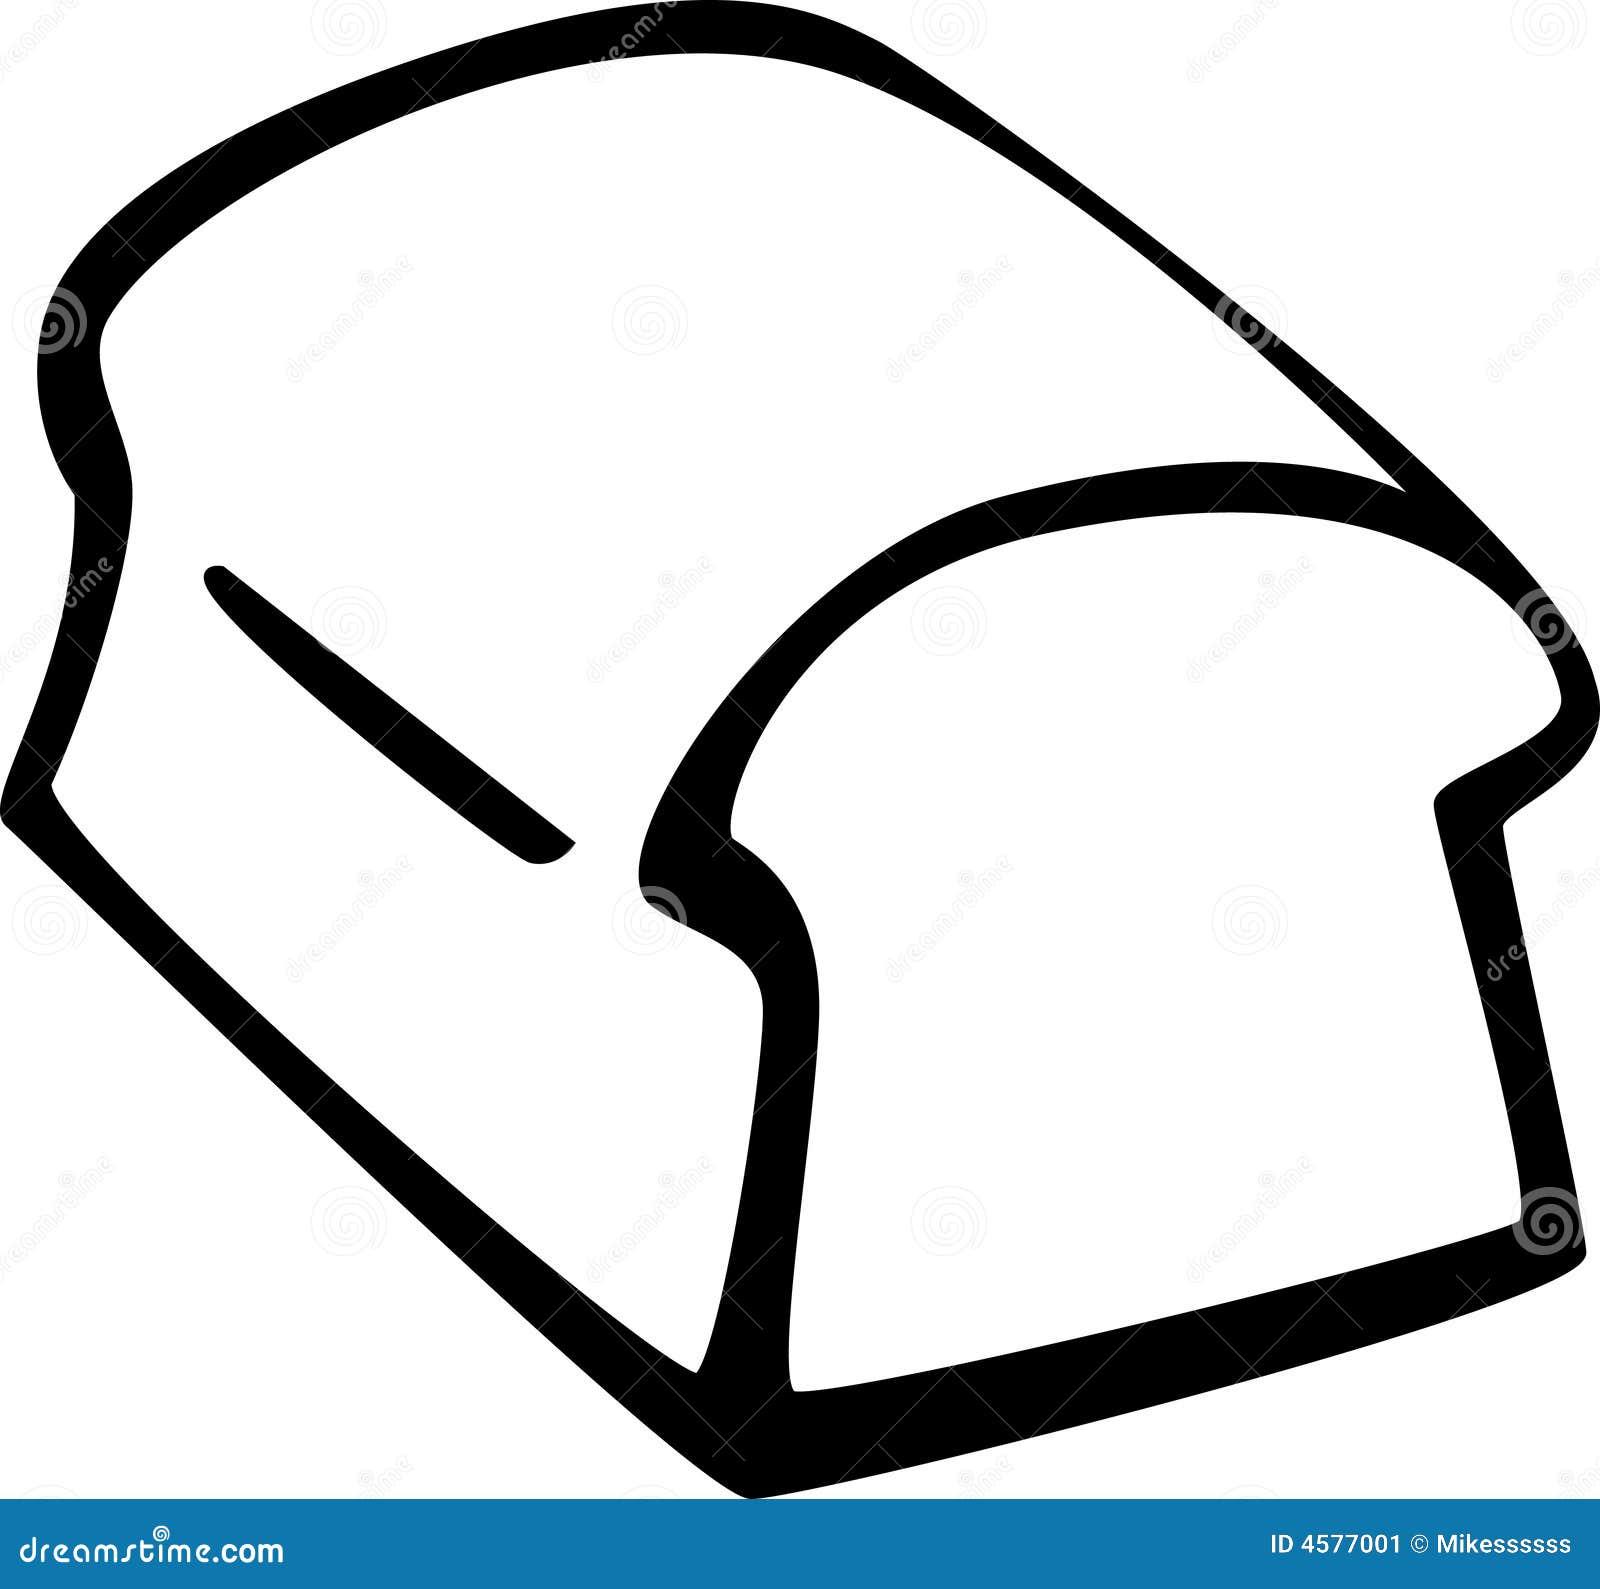 Uncategorized Loaf Of Bread Drawing bread loaf vector illustration stock image 4577001 royalty free photo download loaf